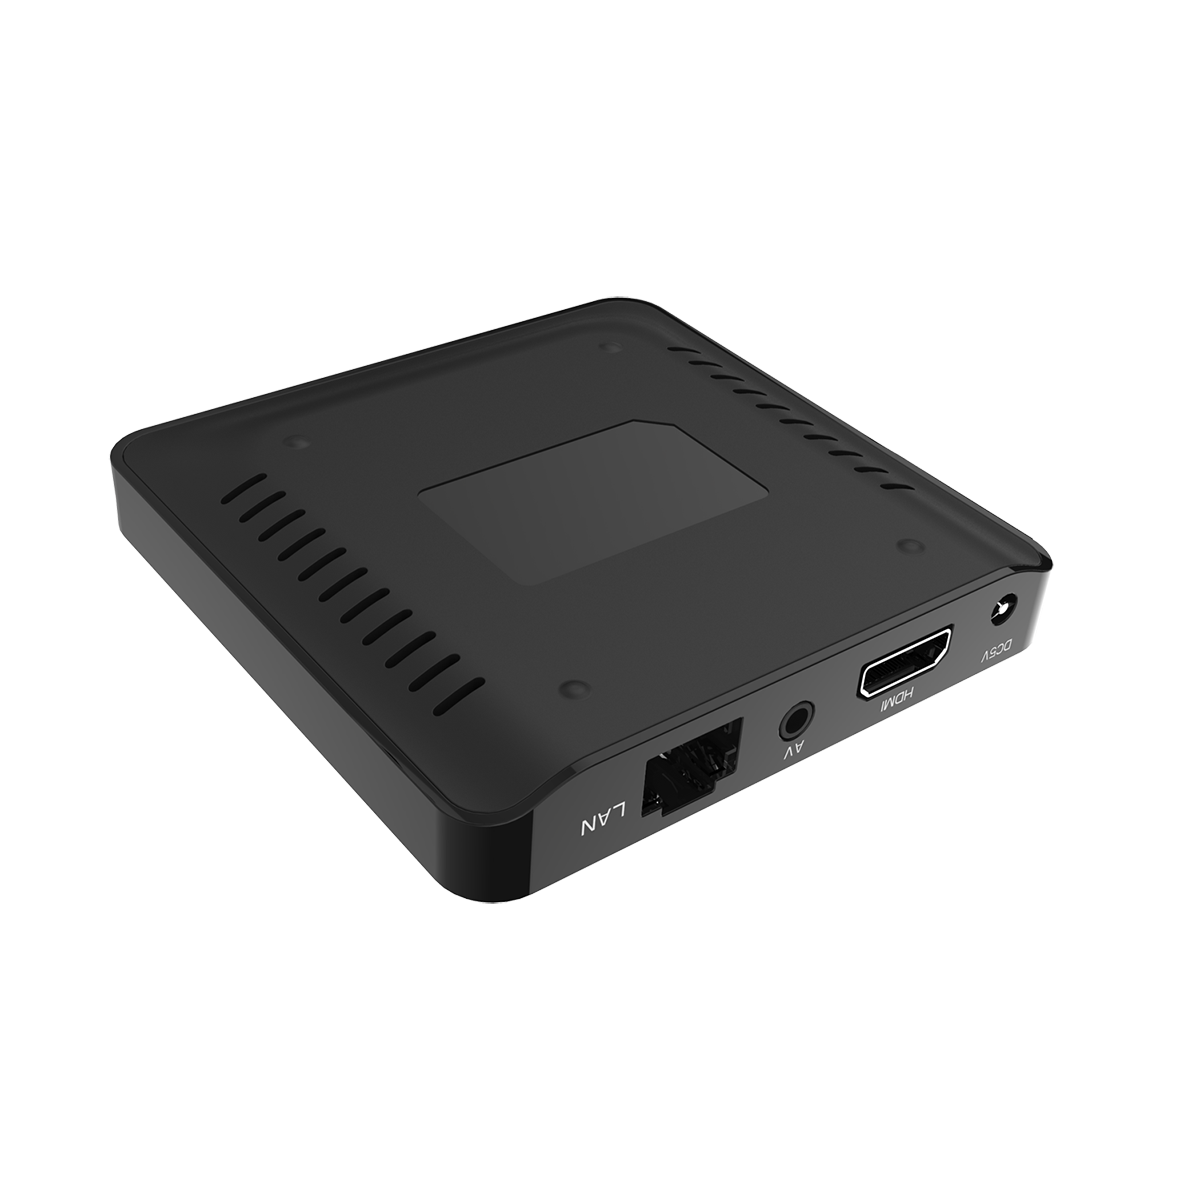 Firefly box A95X Amlogic S905 Quad core Cortex A53 2.0GHz 64bit 11